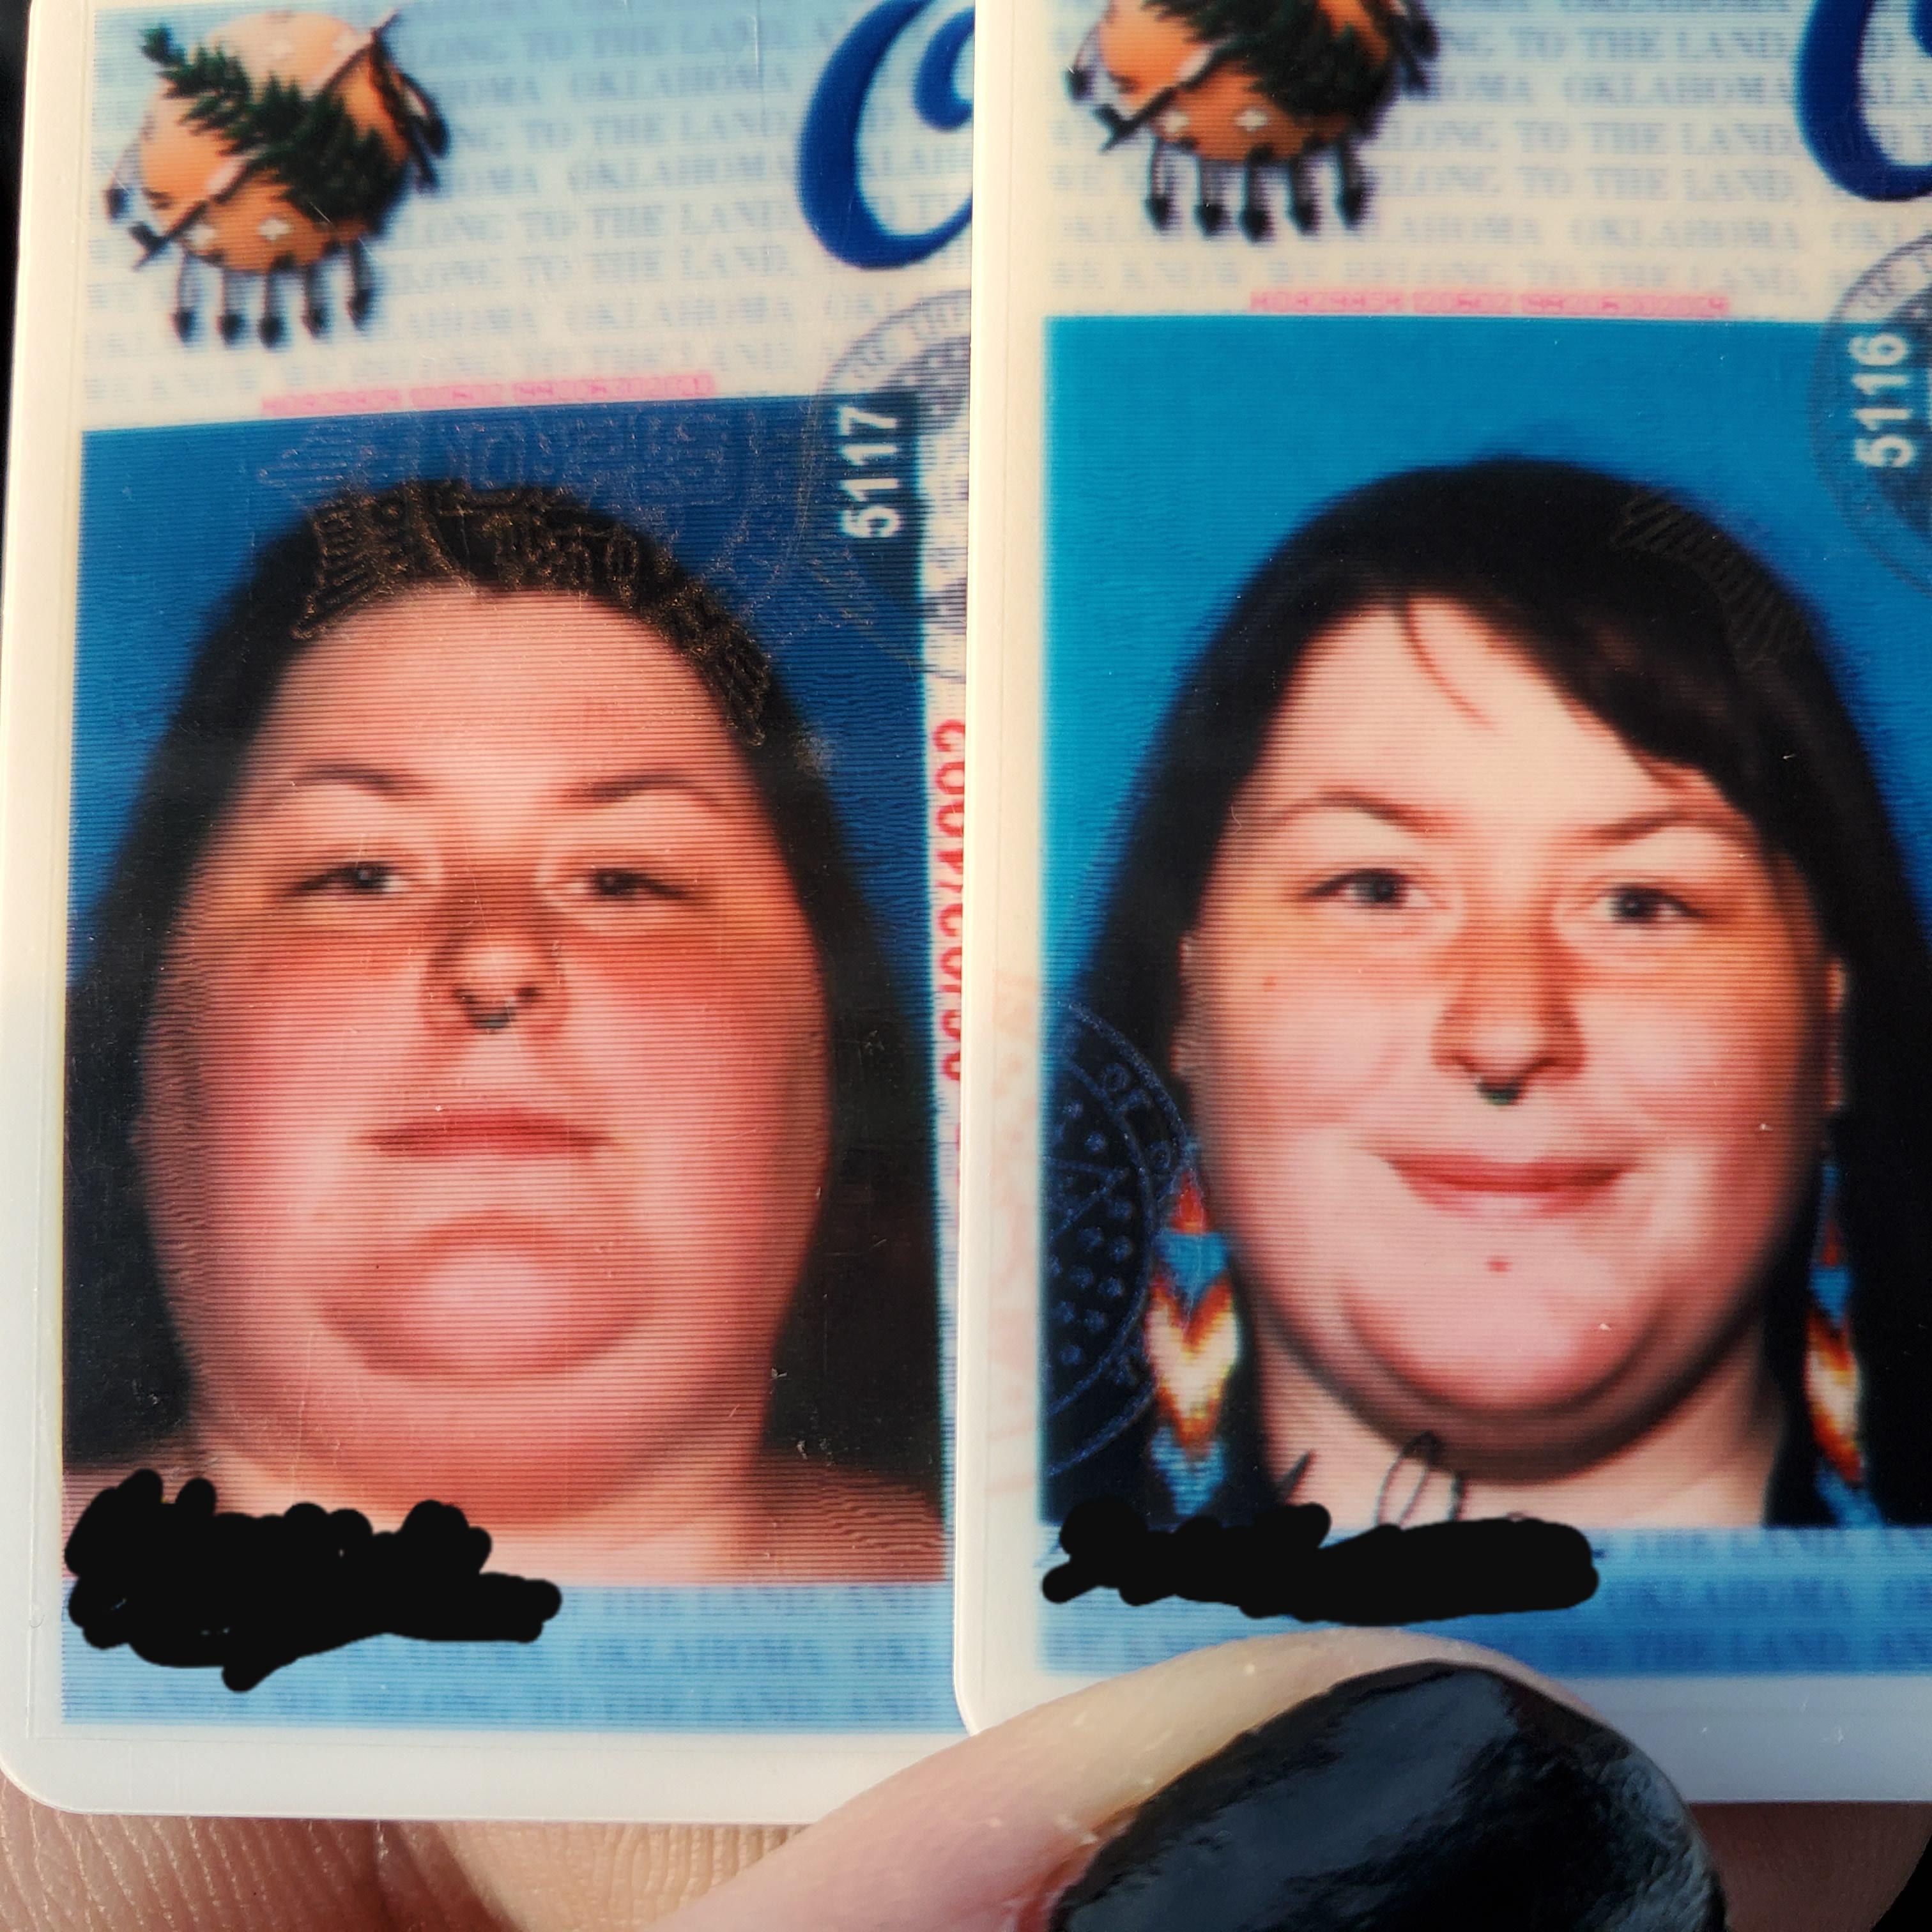 113 lbs Fat Loss 5'7 Female 398 lbs to 285 lbs